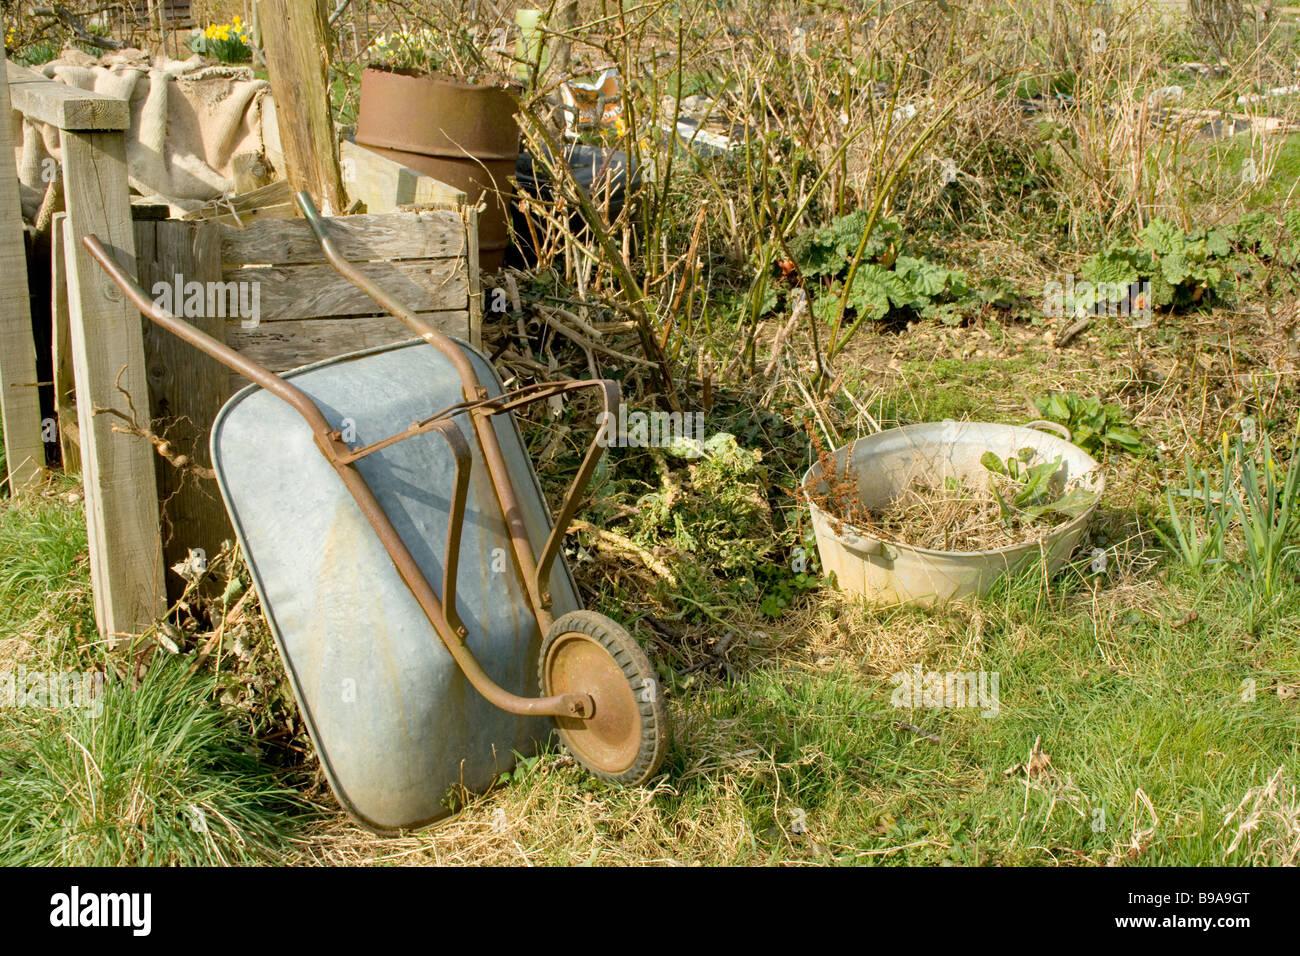 Wheelbarrow in wild garden - Stock Image